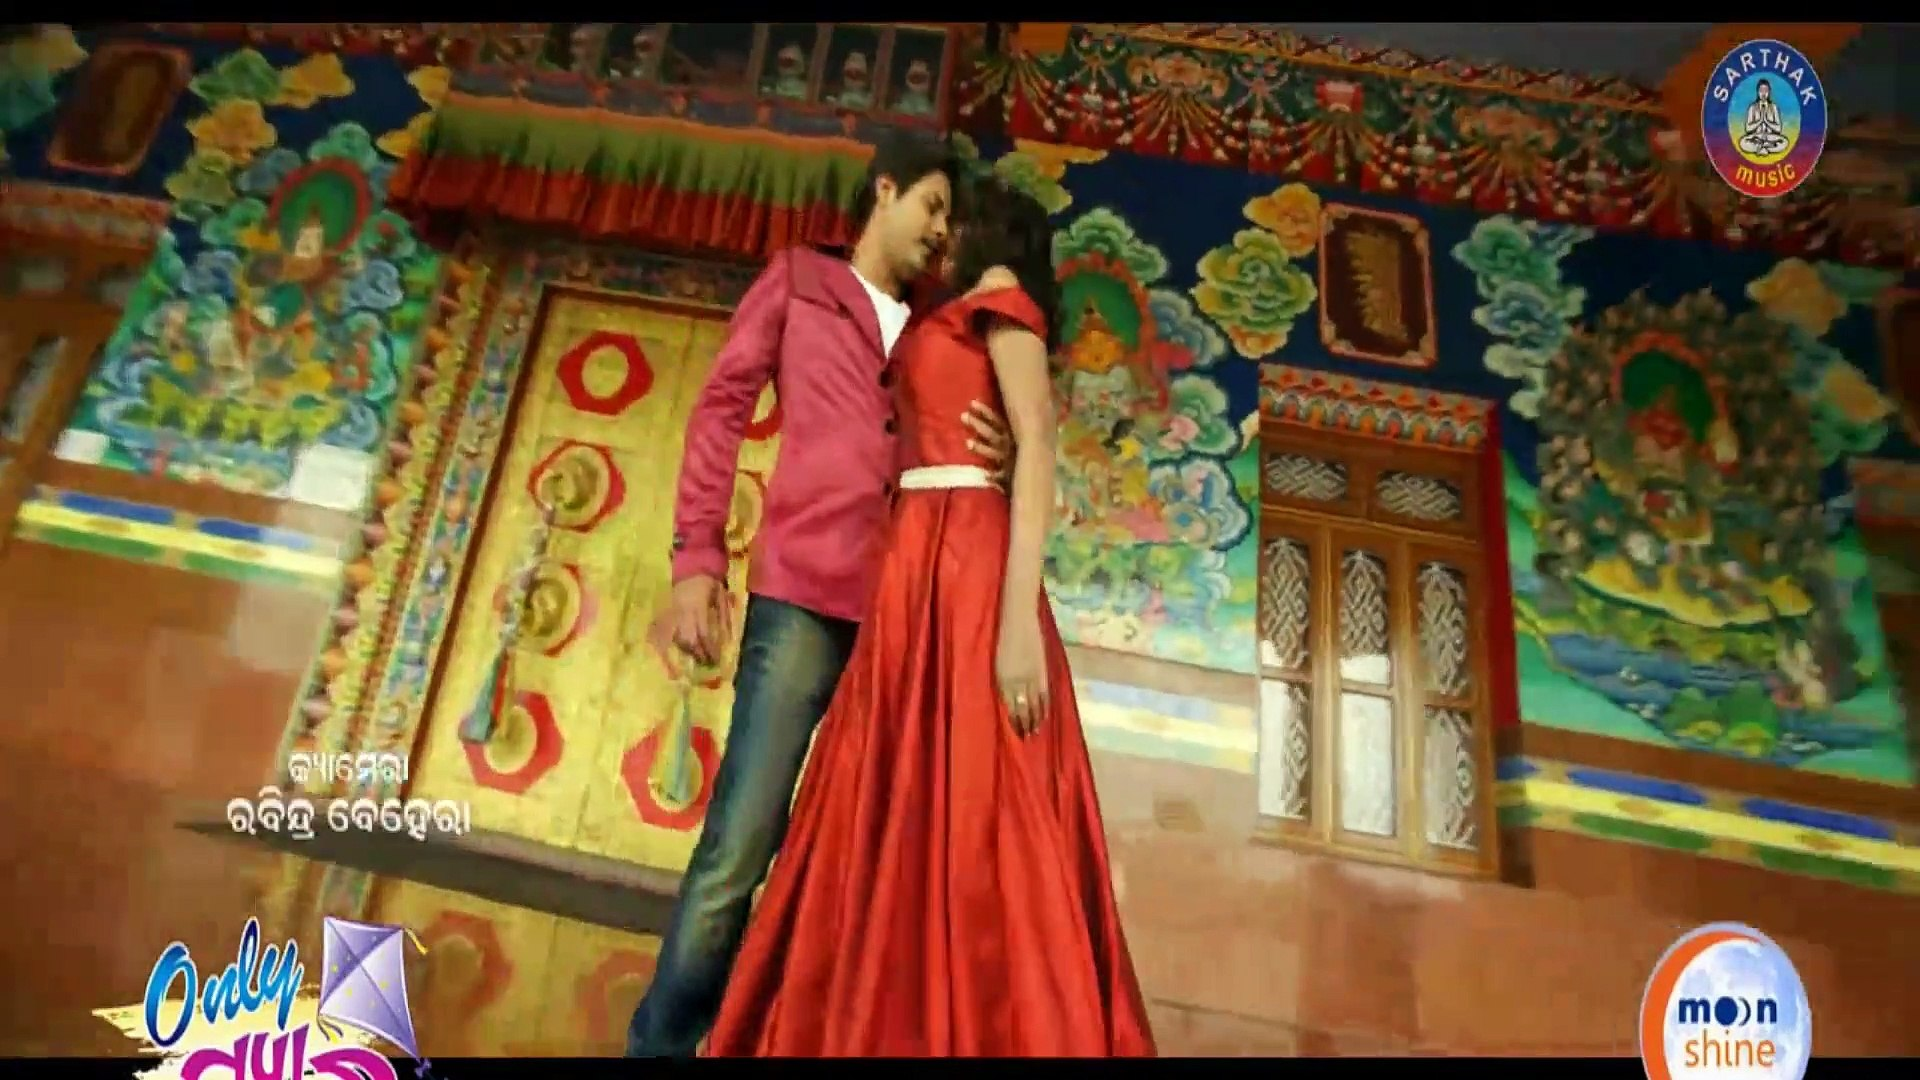 Silly_Silly  - Only_Pyar_(Title) Video - Babushan  And Supriya - Only_Pyar Odia Film - New Odia Movi